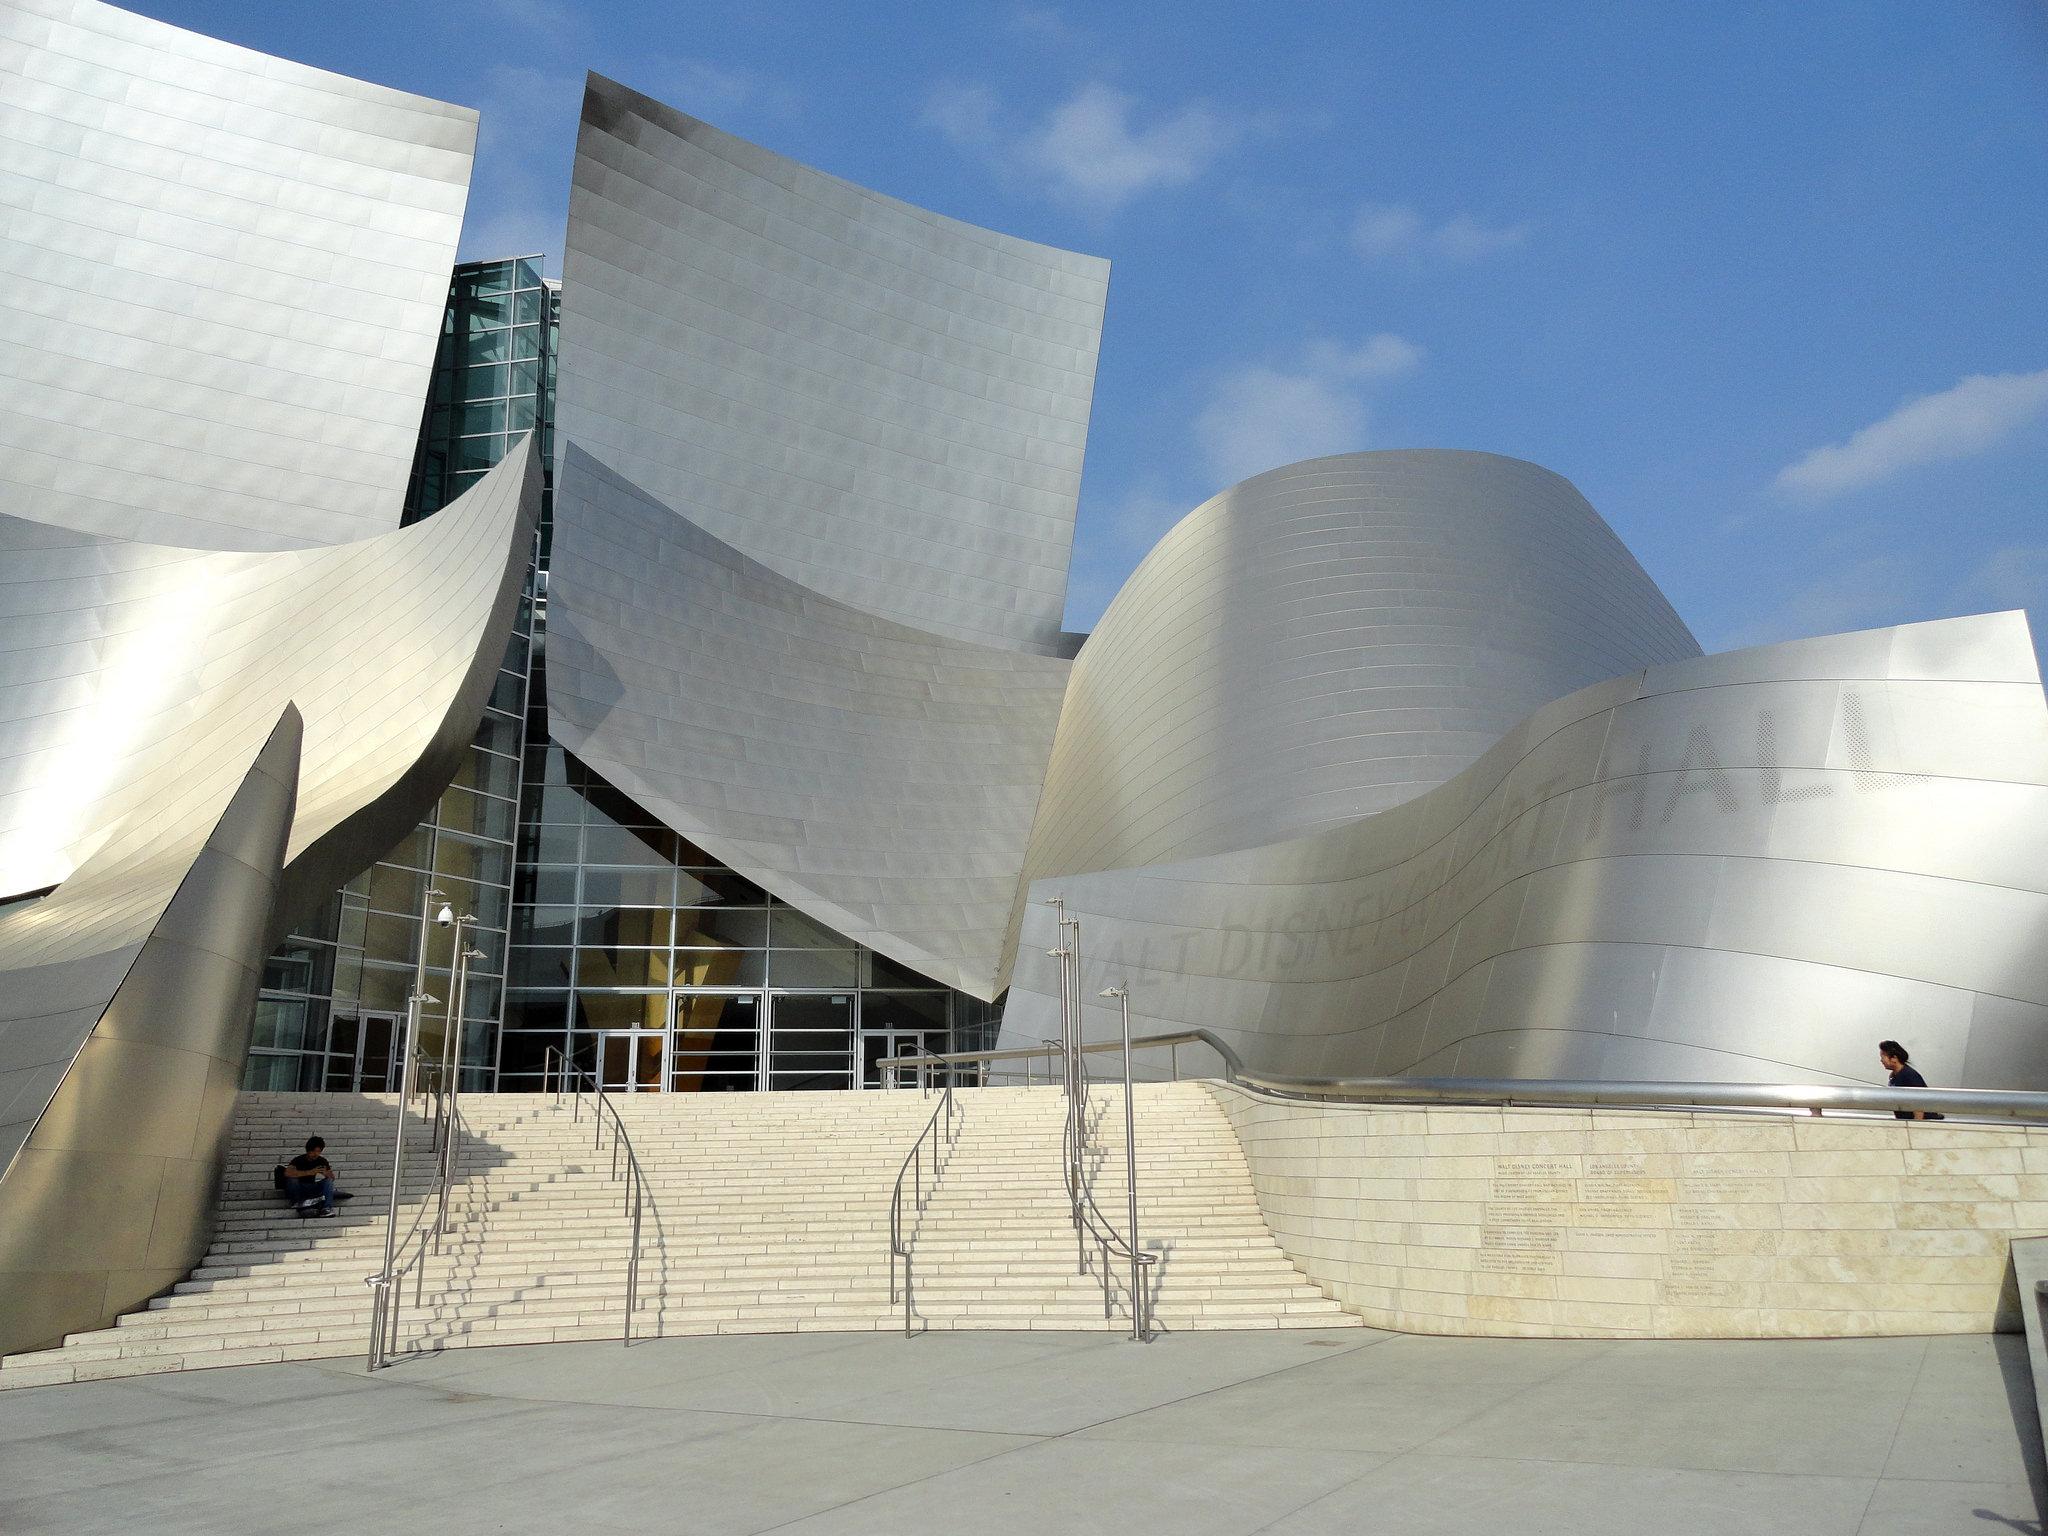 Walt Disney Concert Hall © Fablo Achilli / Flickr